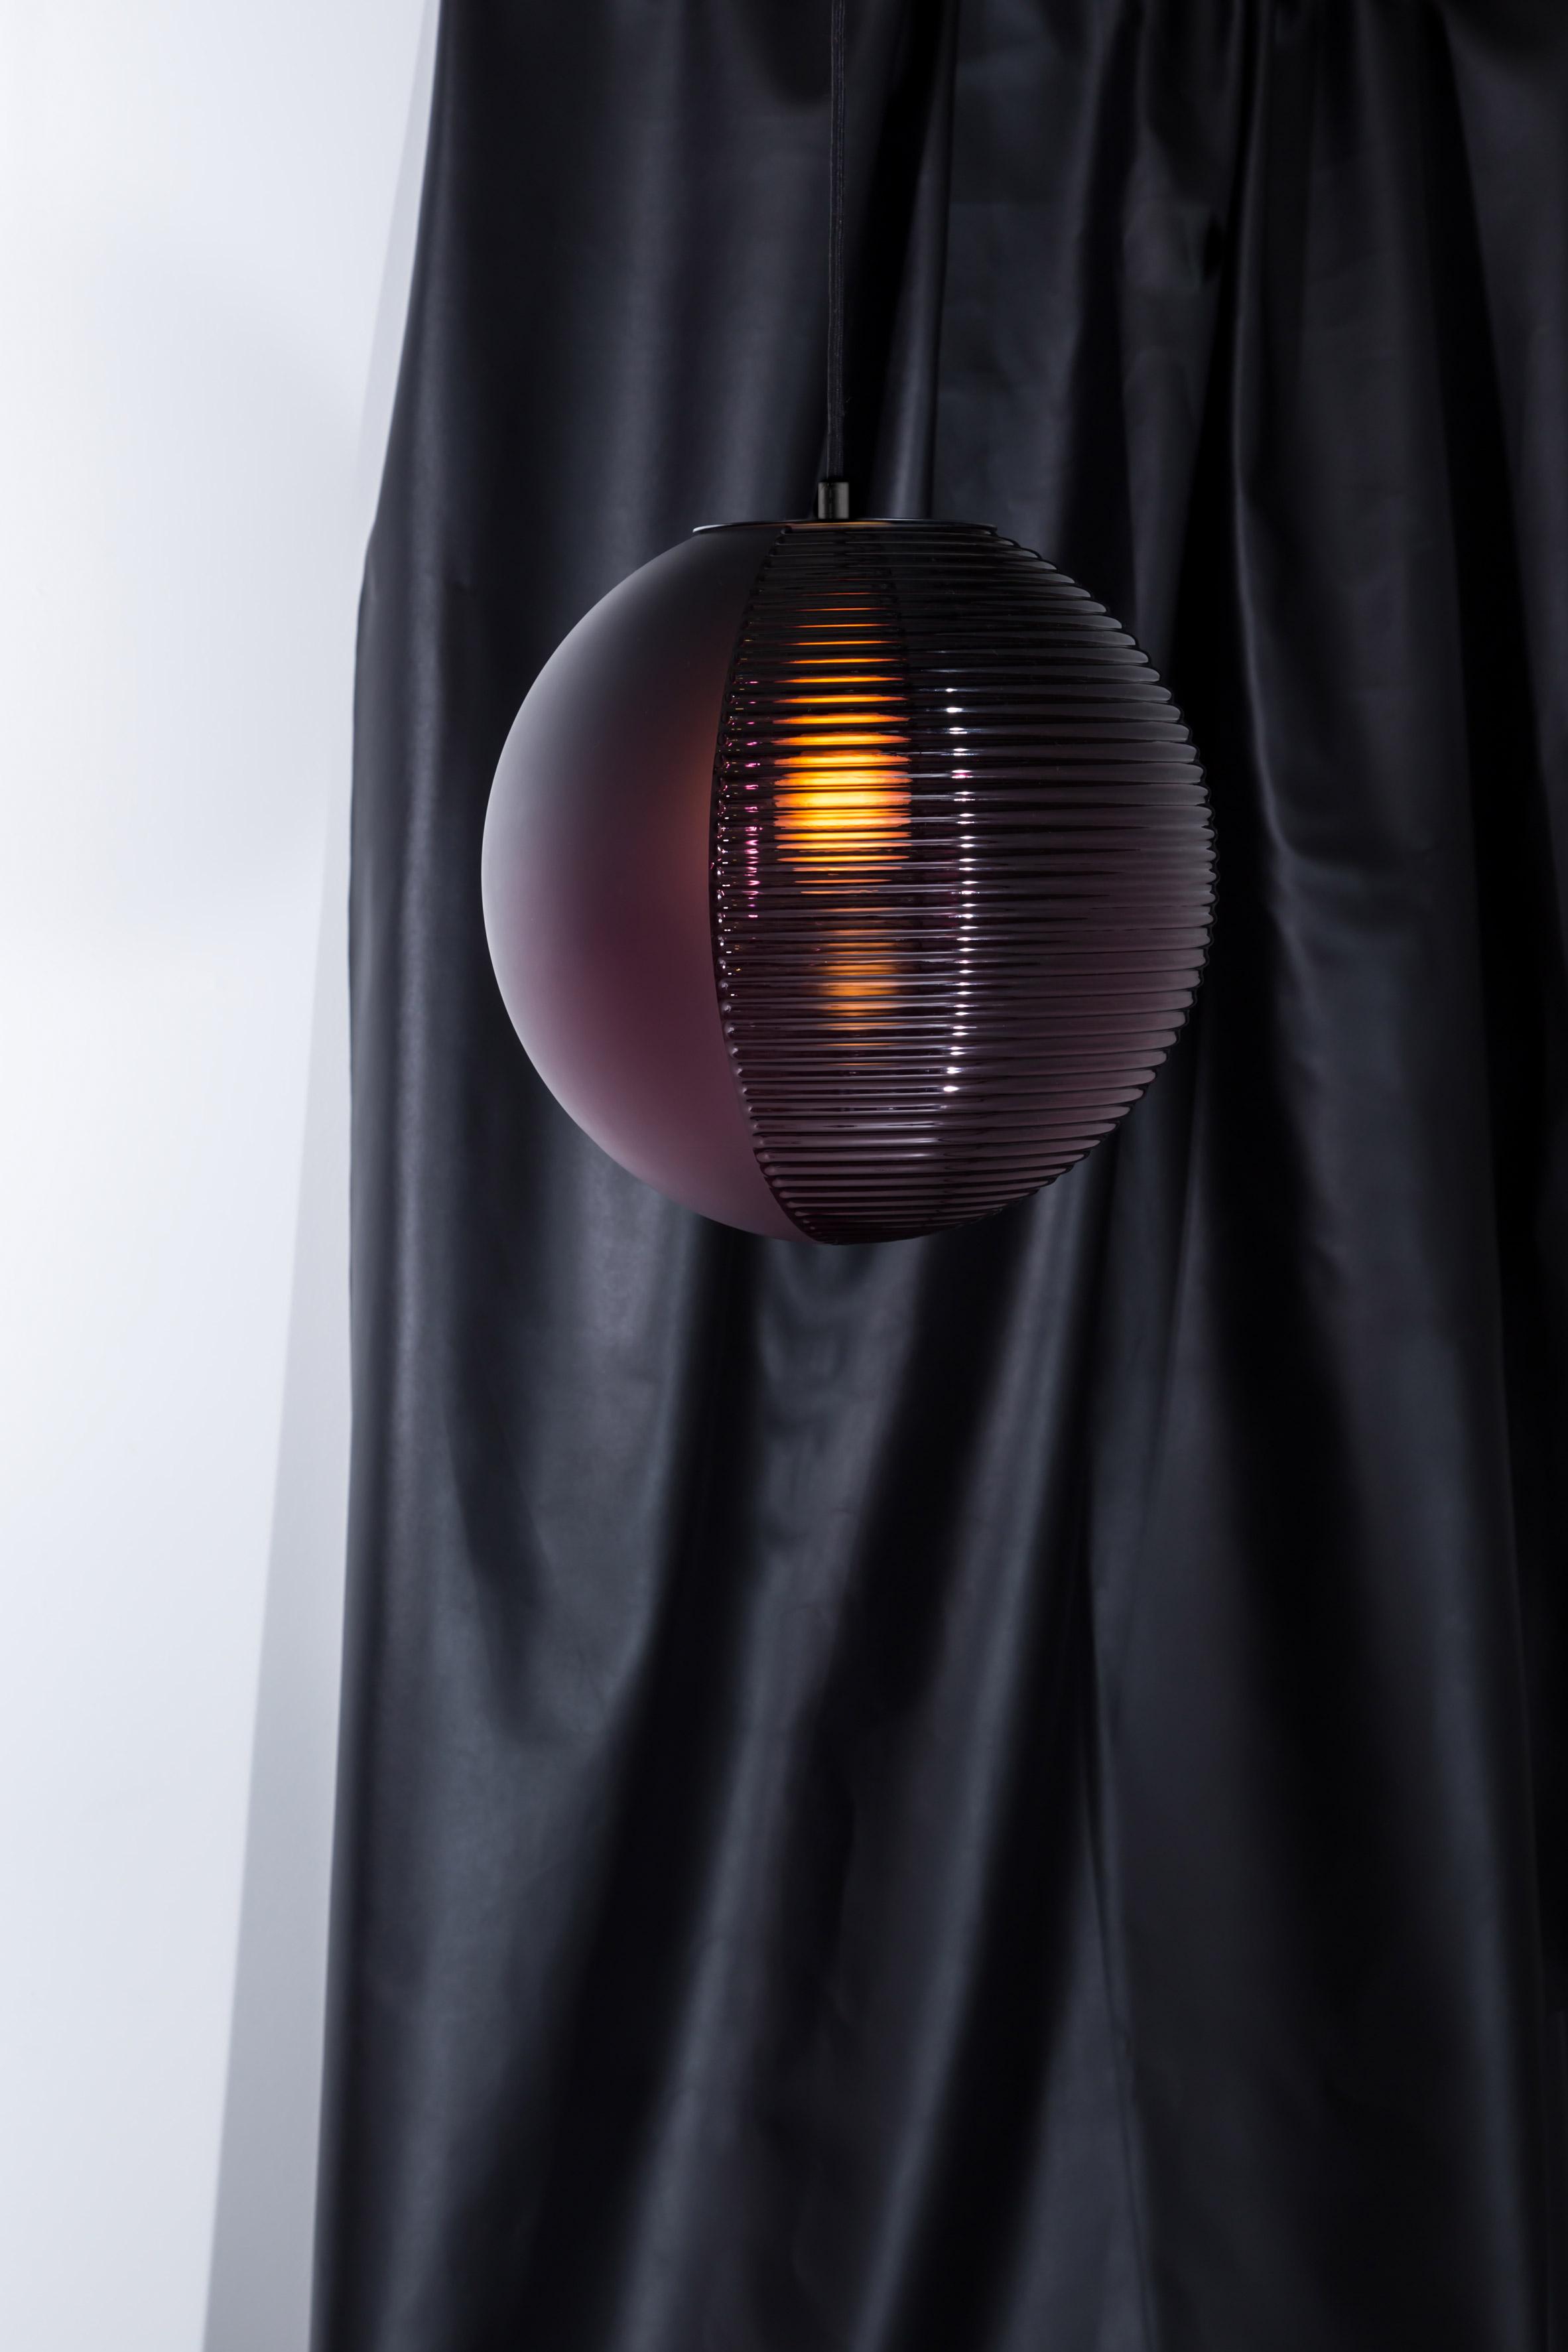 Sebastian Herkner's Stellar lamps fuse two contrasting hemispheres